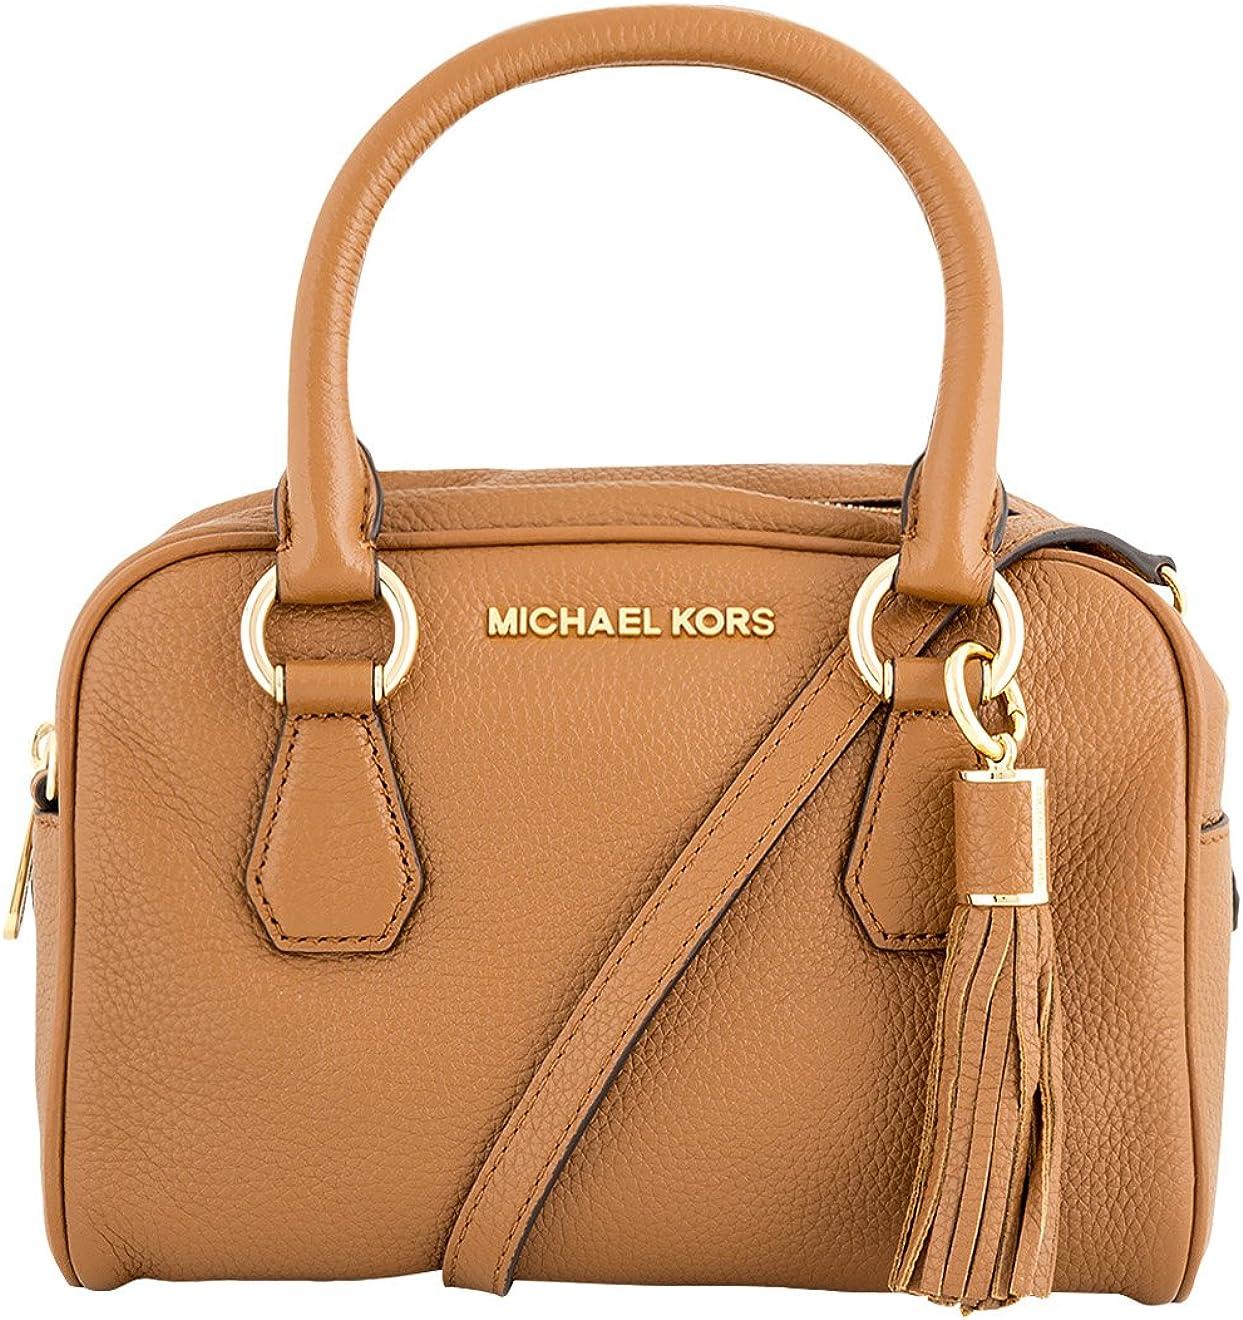 small MK bag